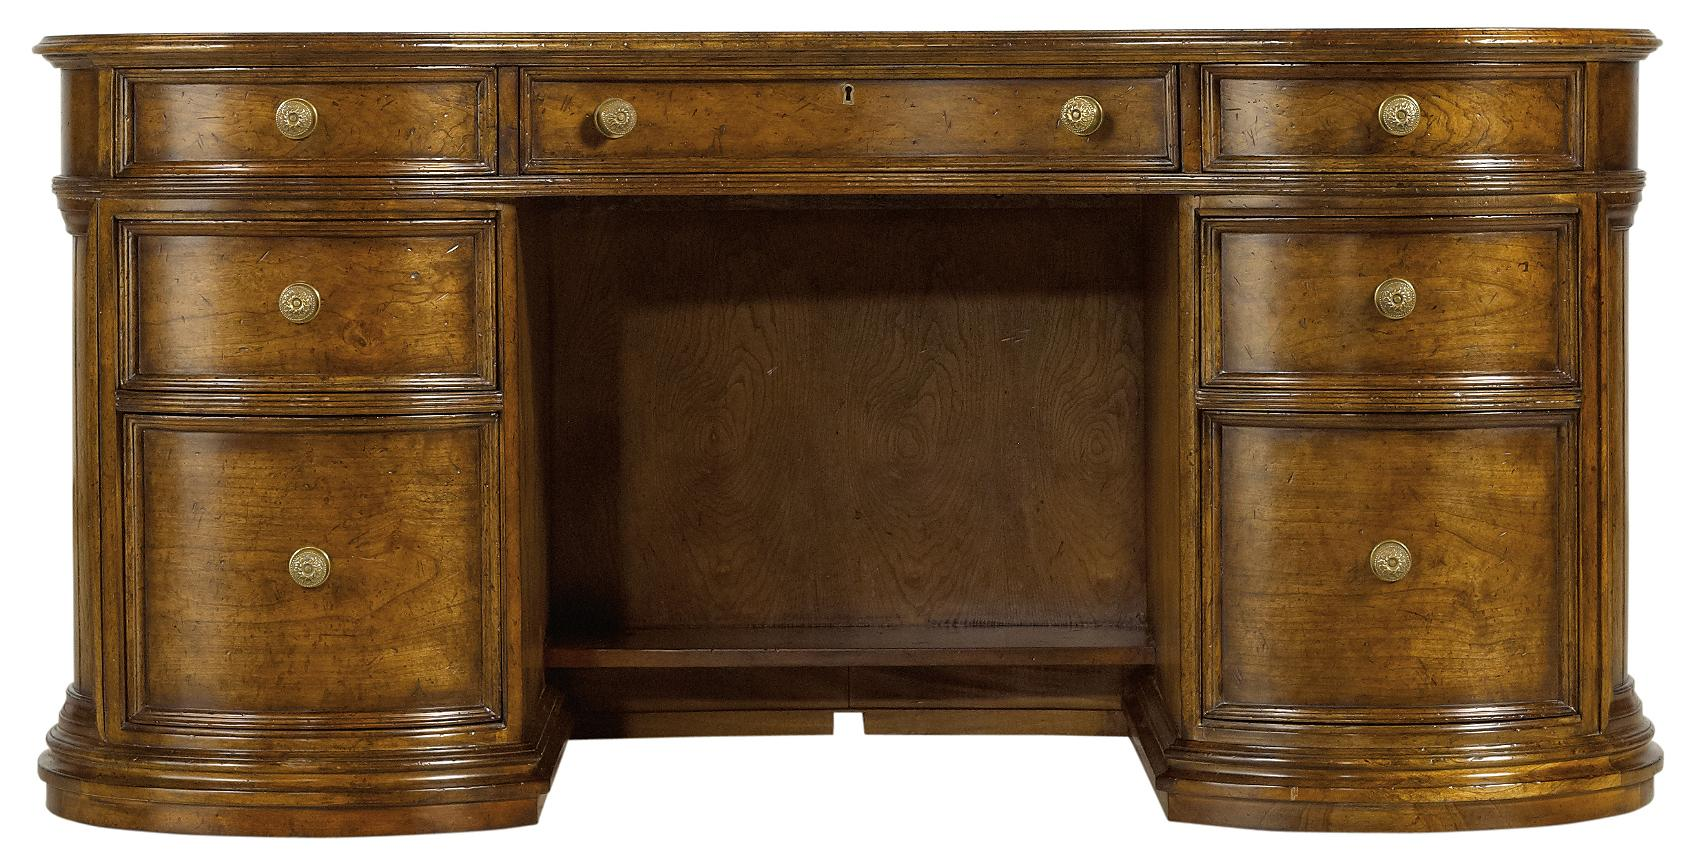 Stanley Furniture Arrondissement École Desk - Item Number: 222-15-04